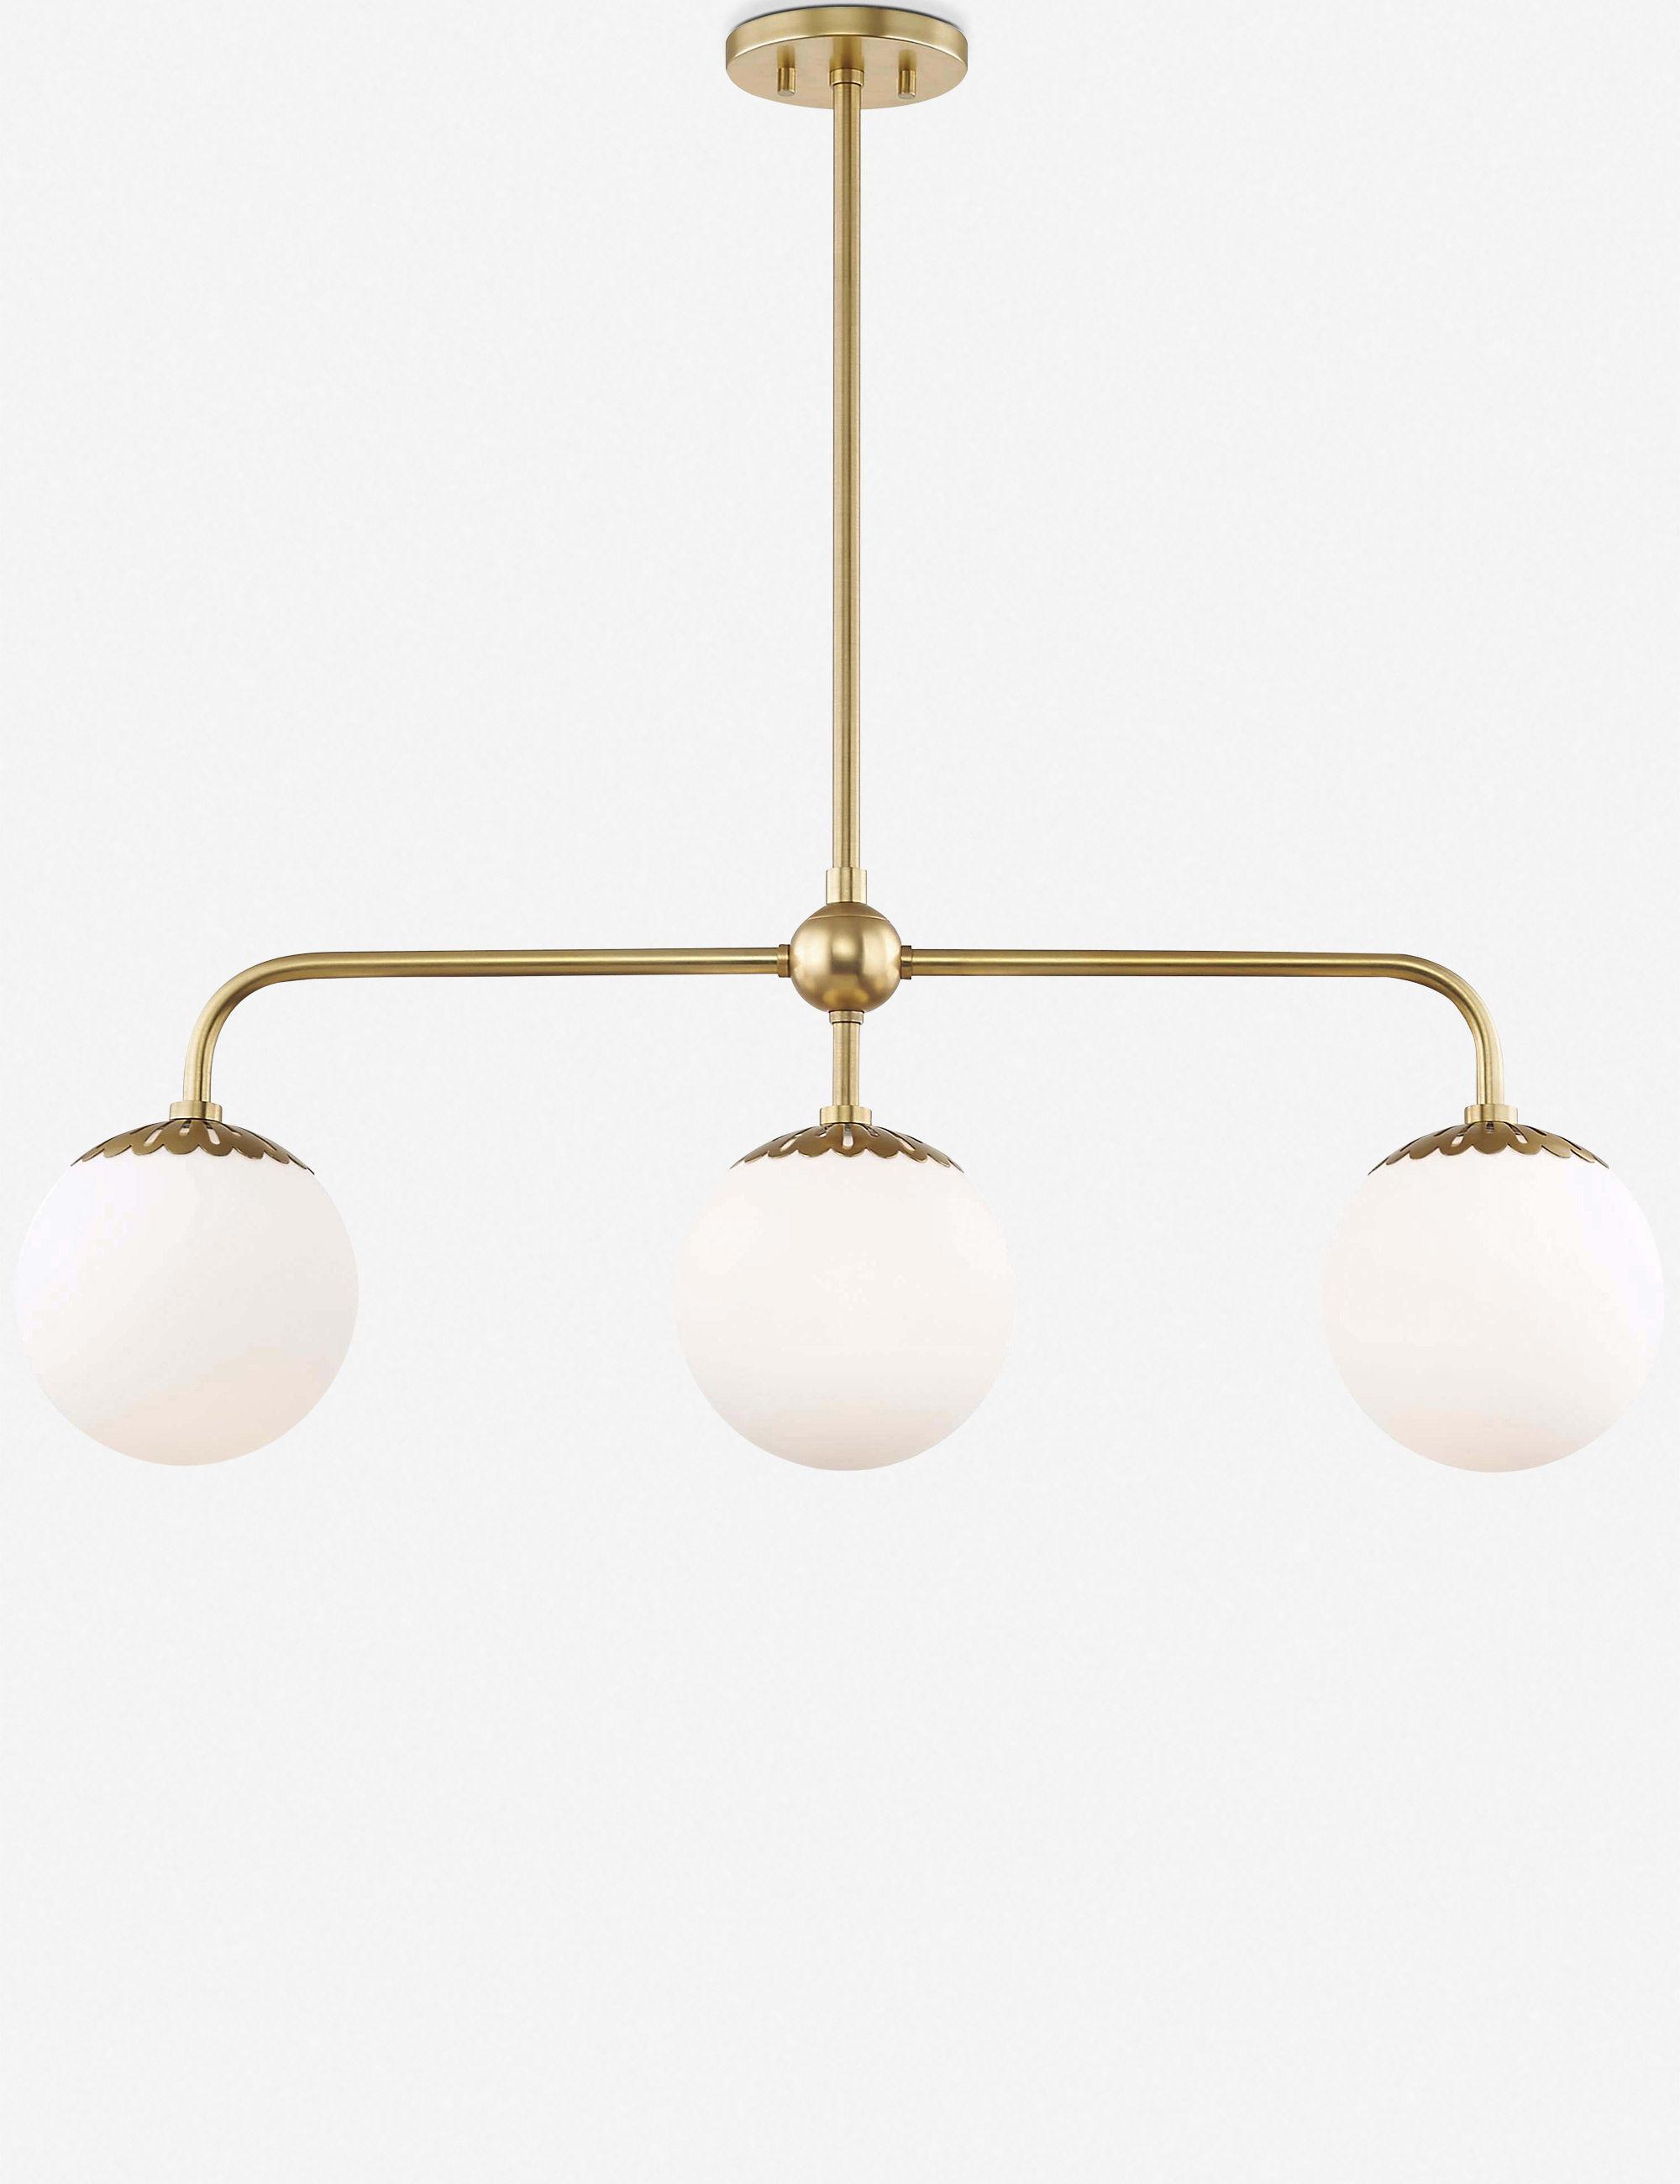 Annetta Linear Chandelier, Aged Brass With Regard To Well Known Novogratz Vintage 5 Light Kitchen Island Bulb Pendants (View 2 of 25)